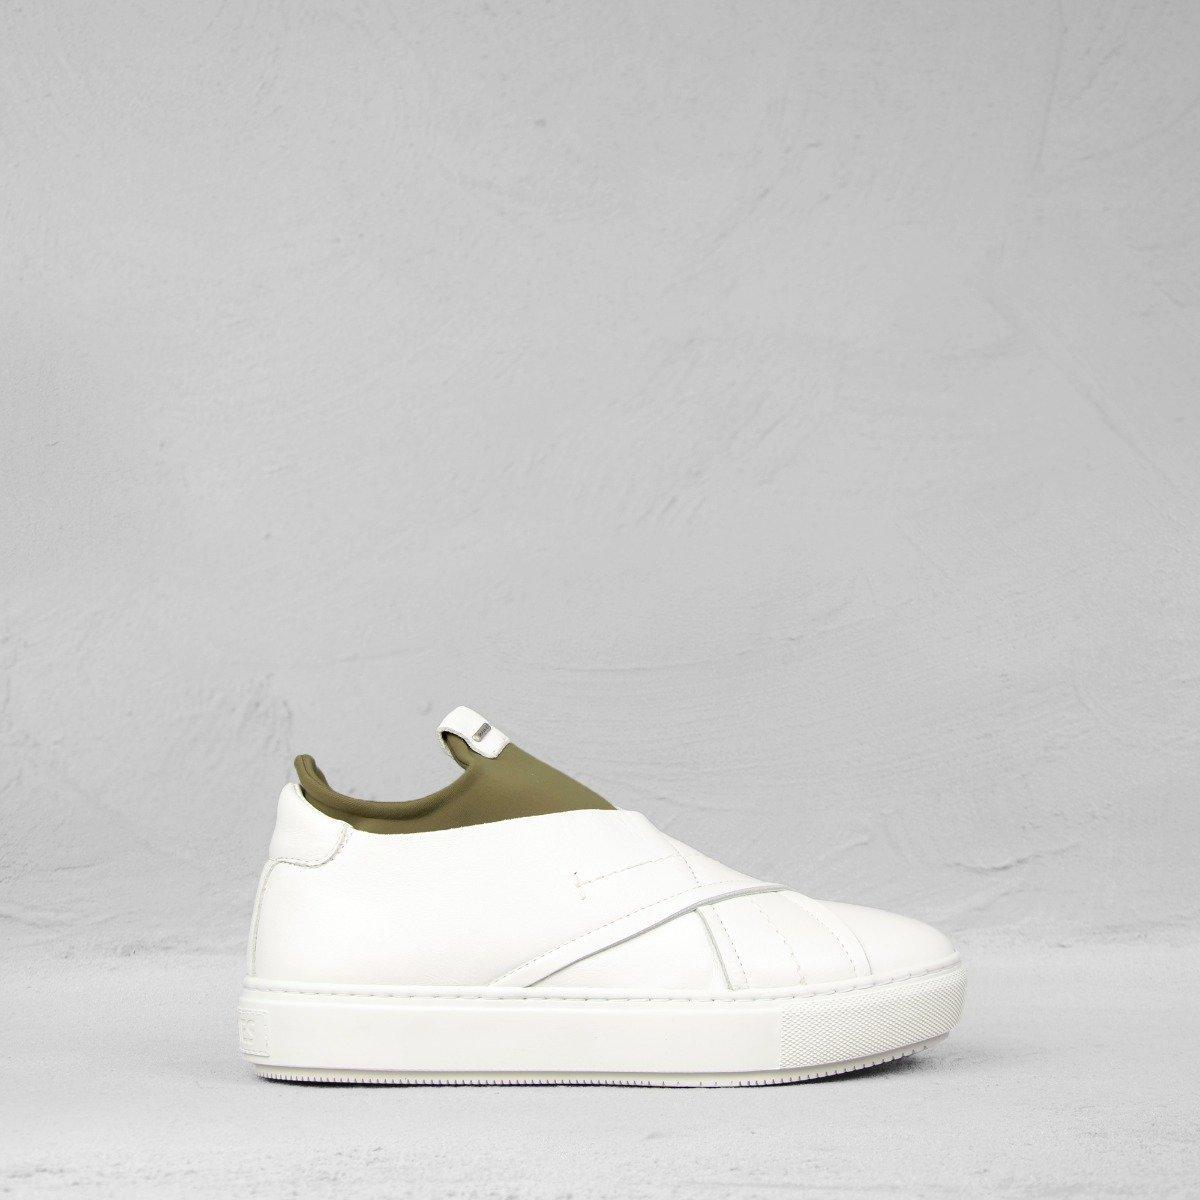 Shabbies Amsterdam Sneaker Chaussette Cuir Lisse Noir Olive hNrJHIDp